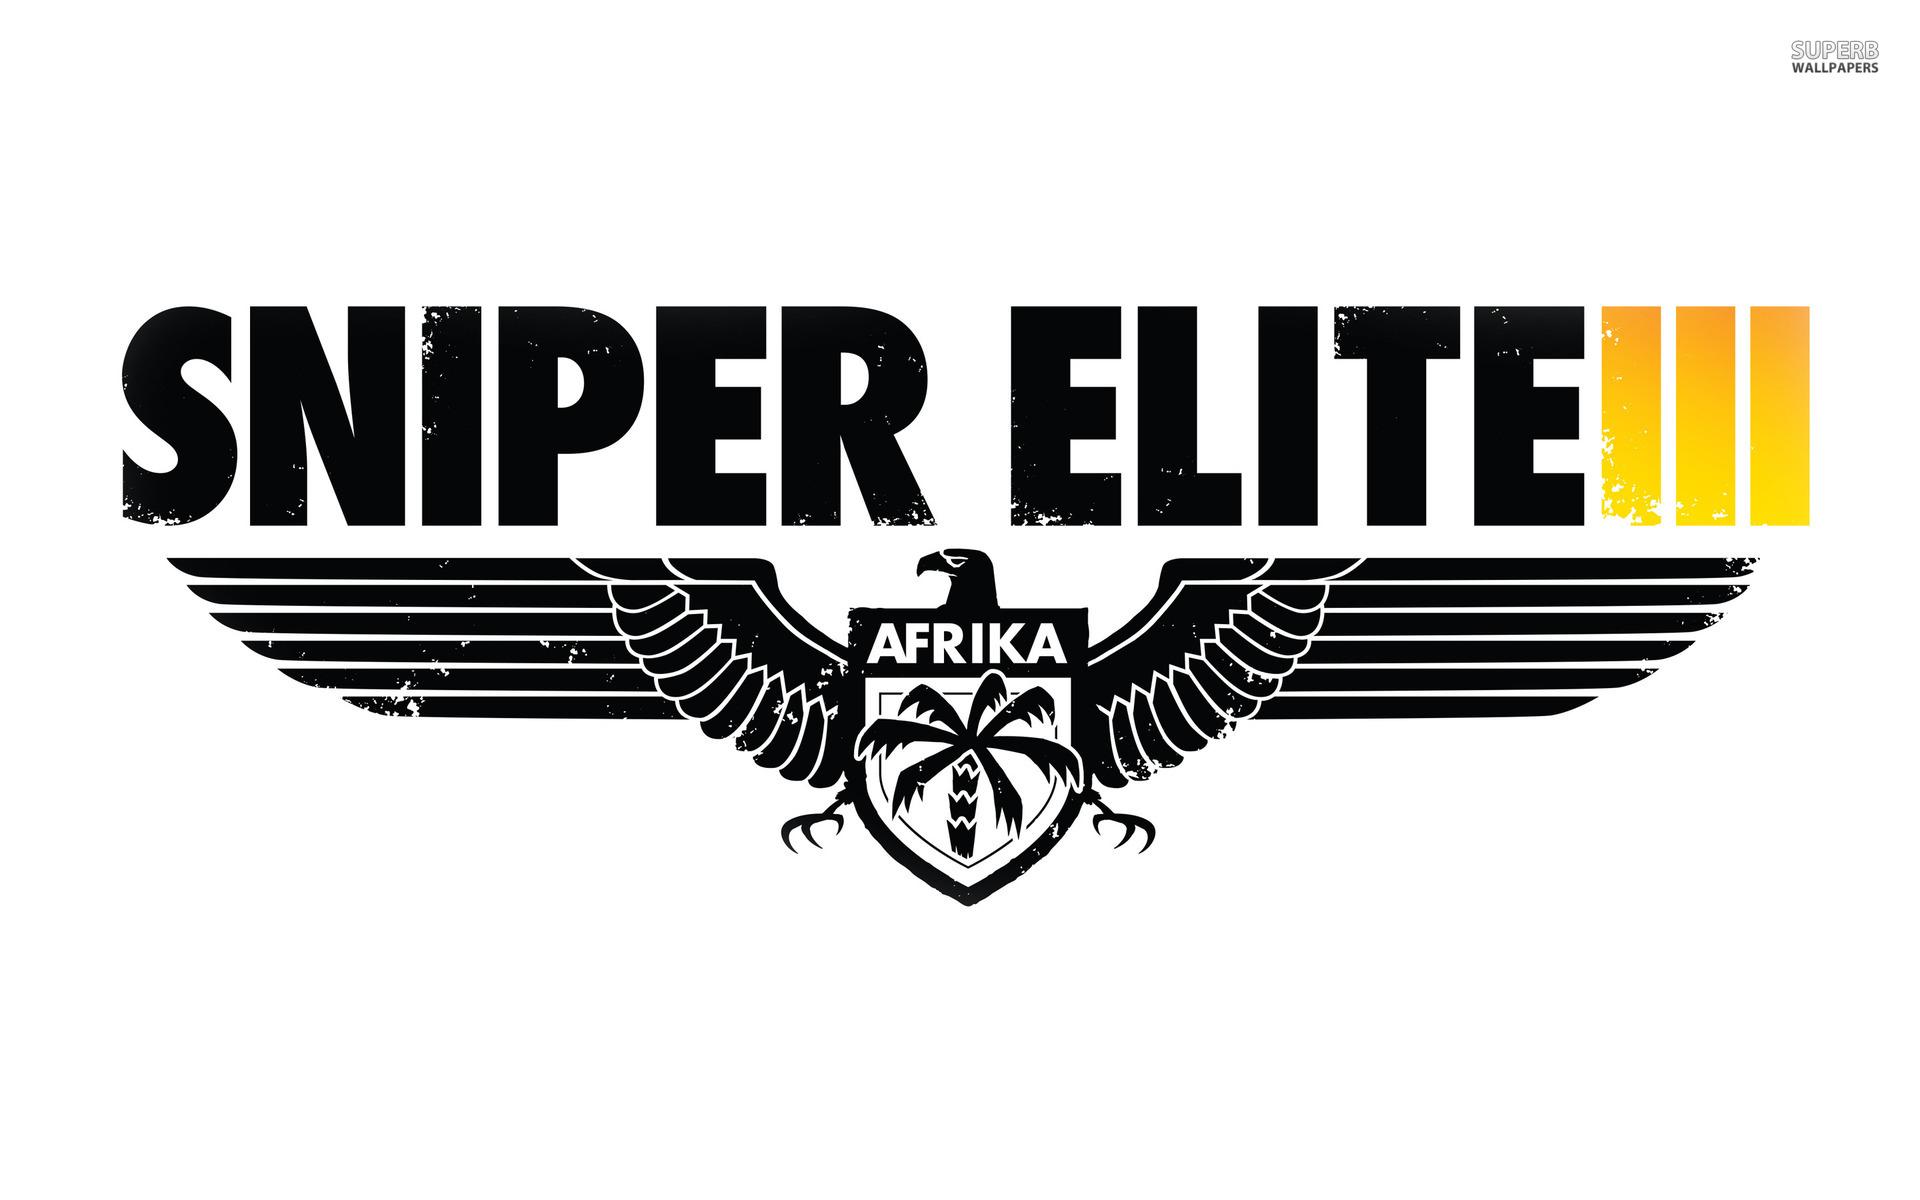 Sniper Elite Iii Podria Tener Una Tasa De Imagenes Mas